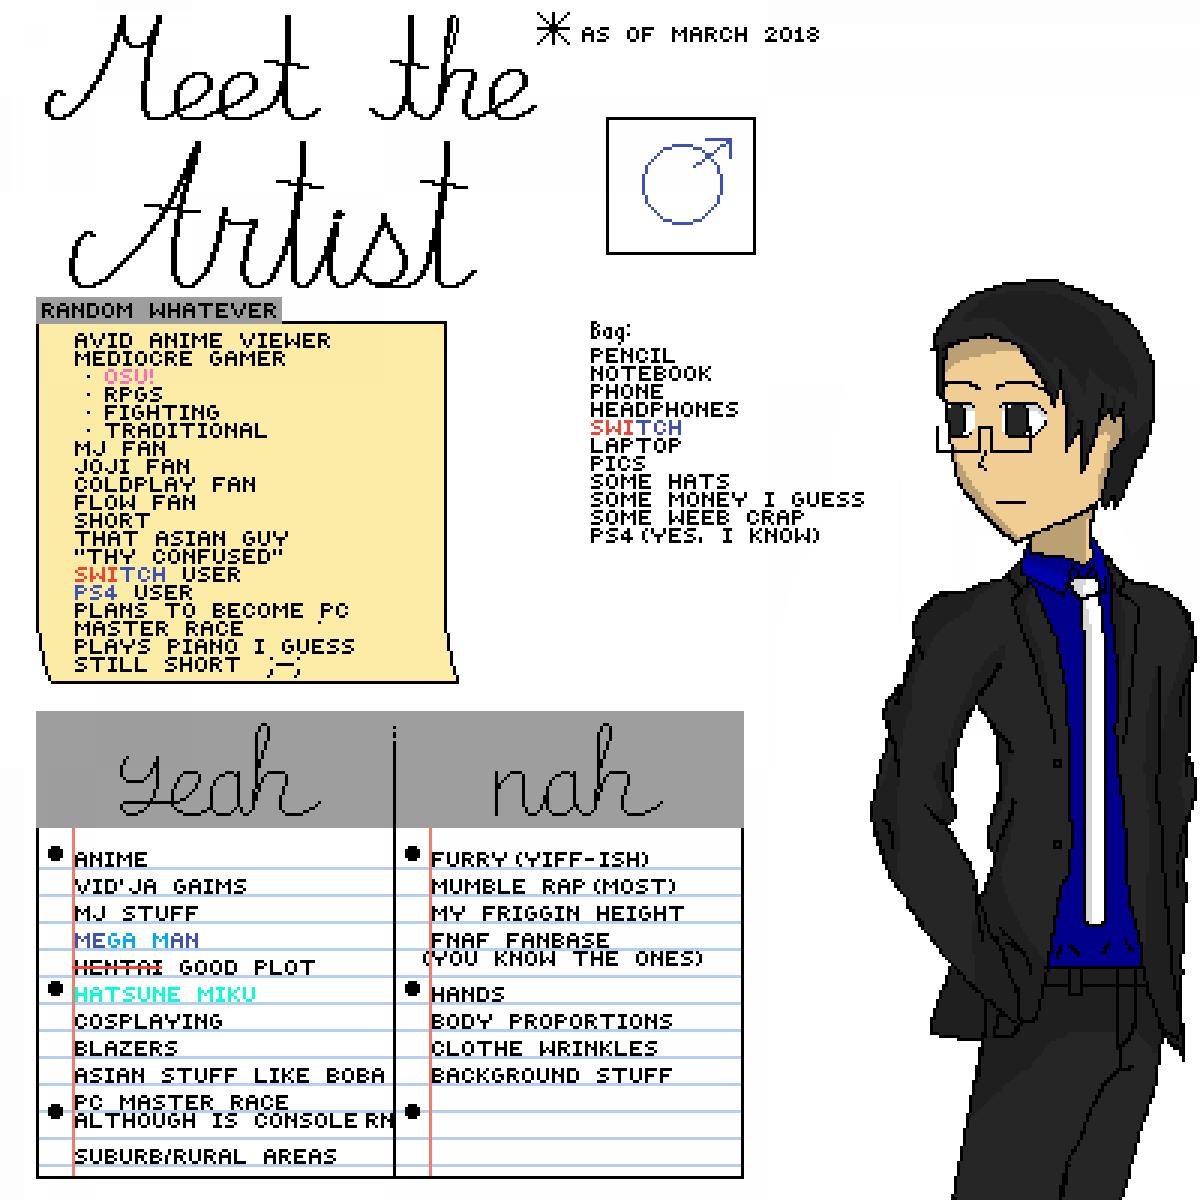 Pixilart - Meet The Artist (March 2018) by ItsXtheEditor